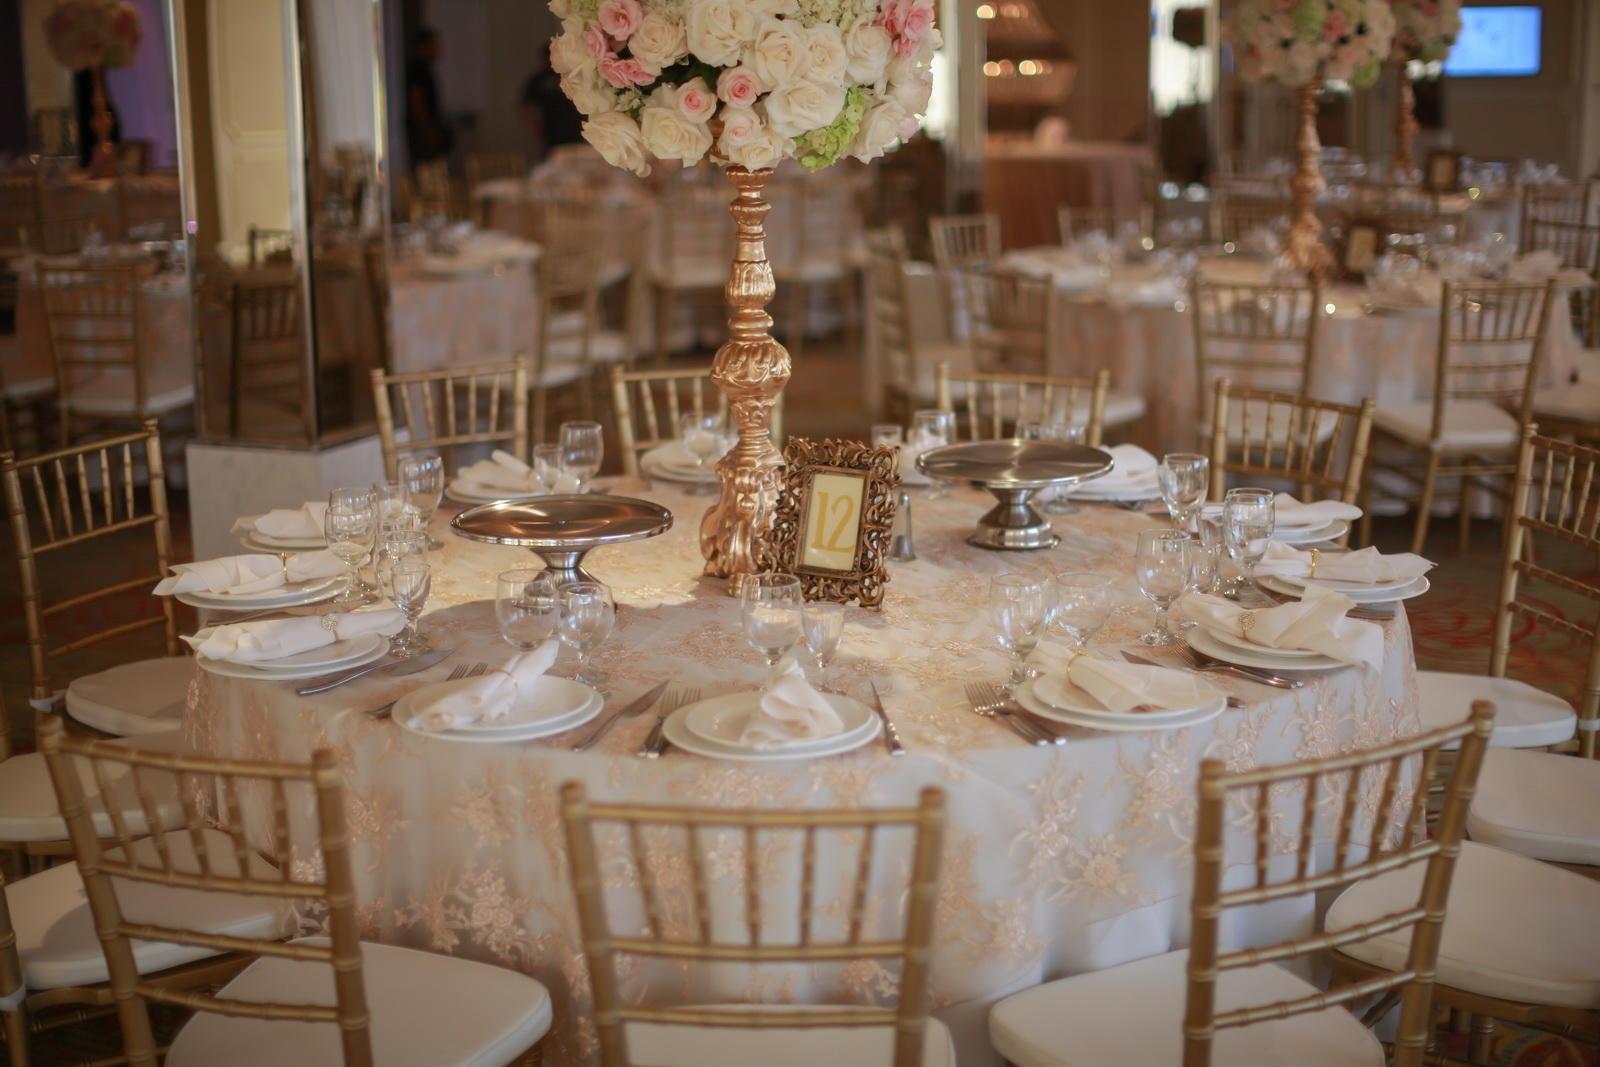 Local Wedding Venues Near Me: Brandview Ballroom / The Patio At